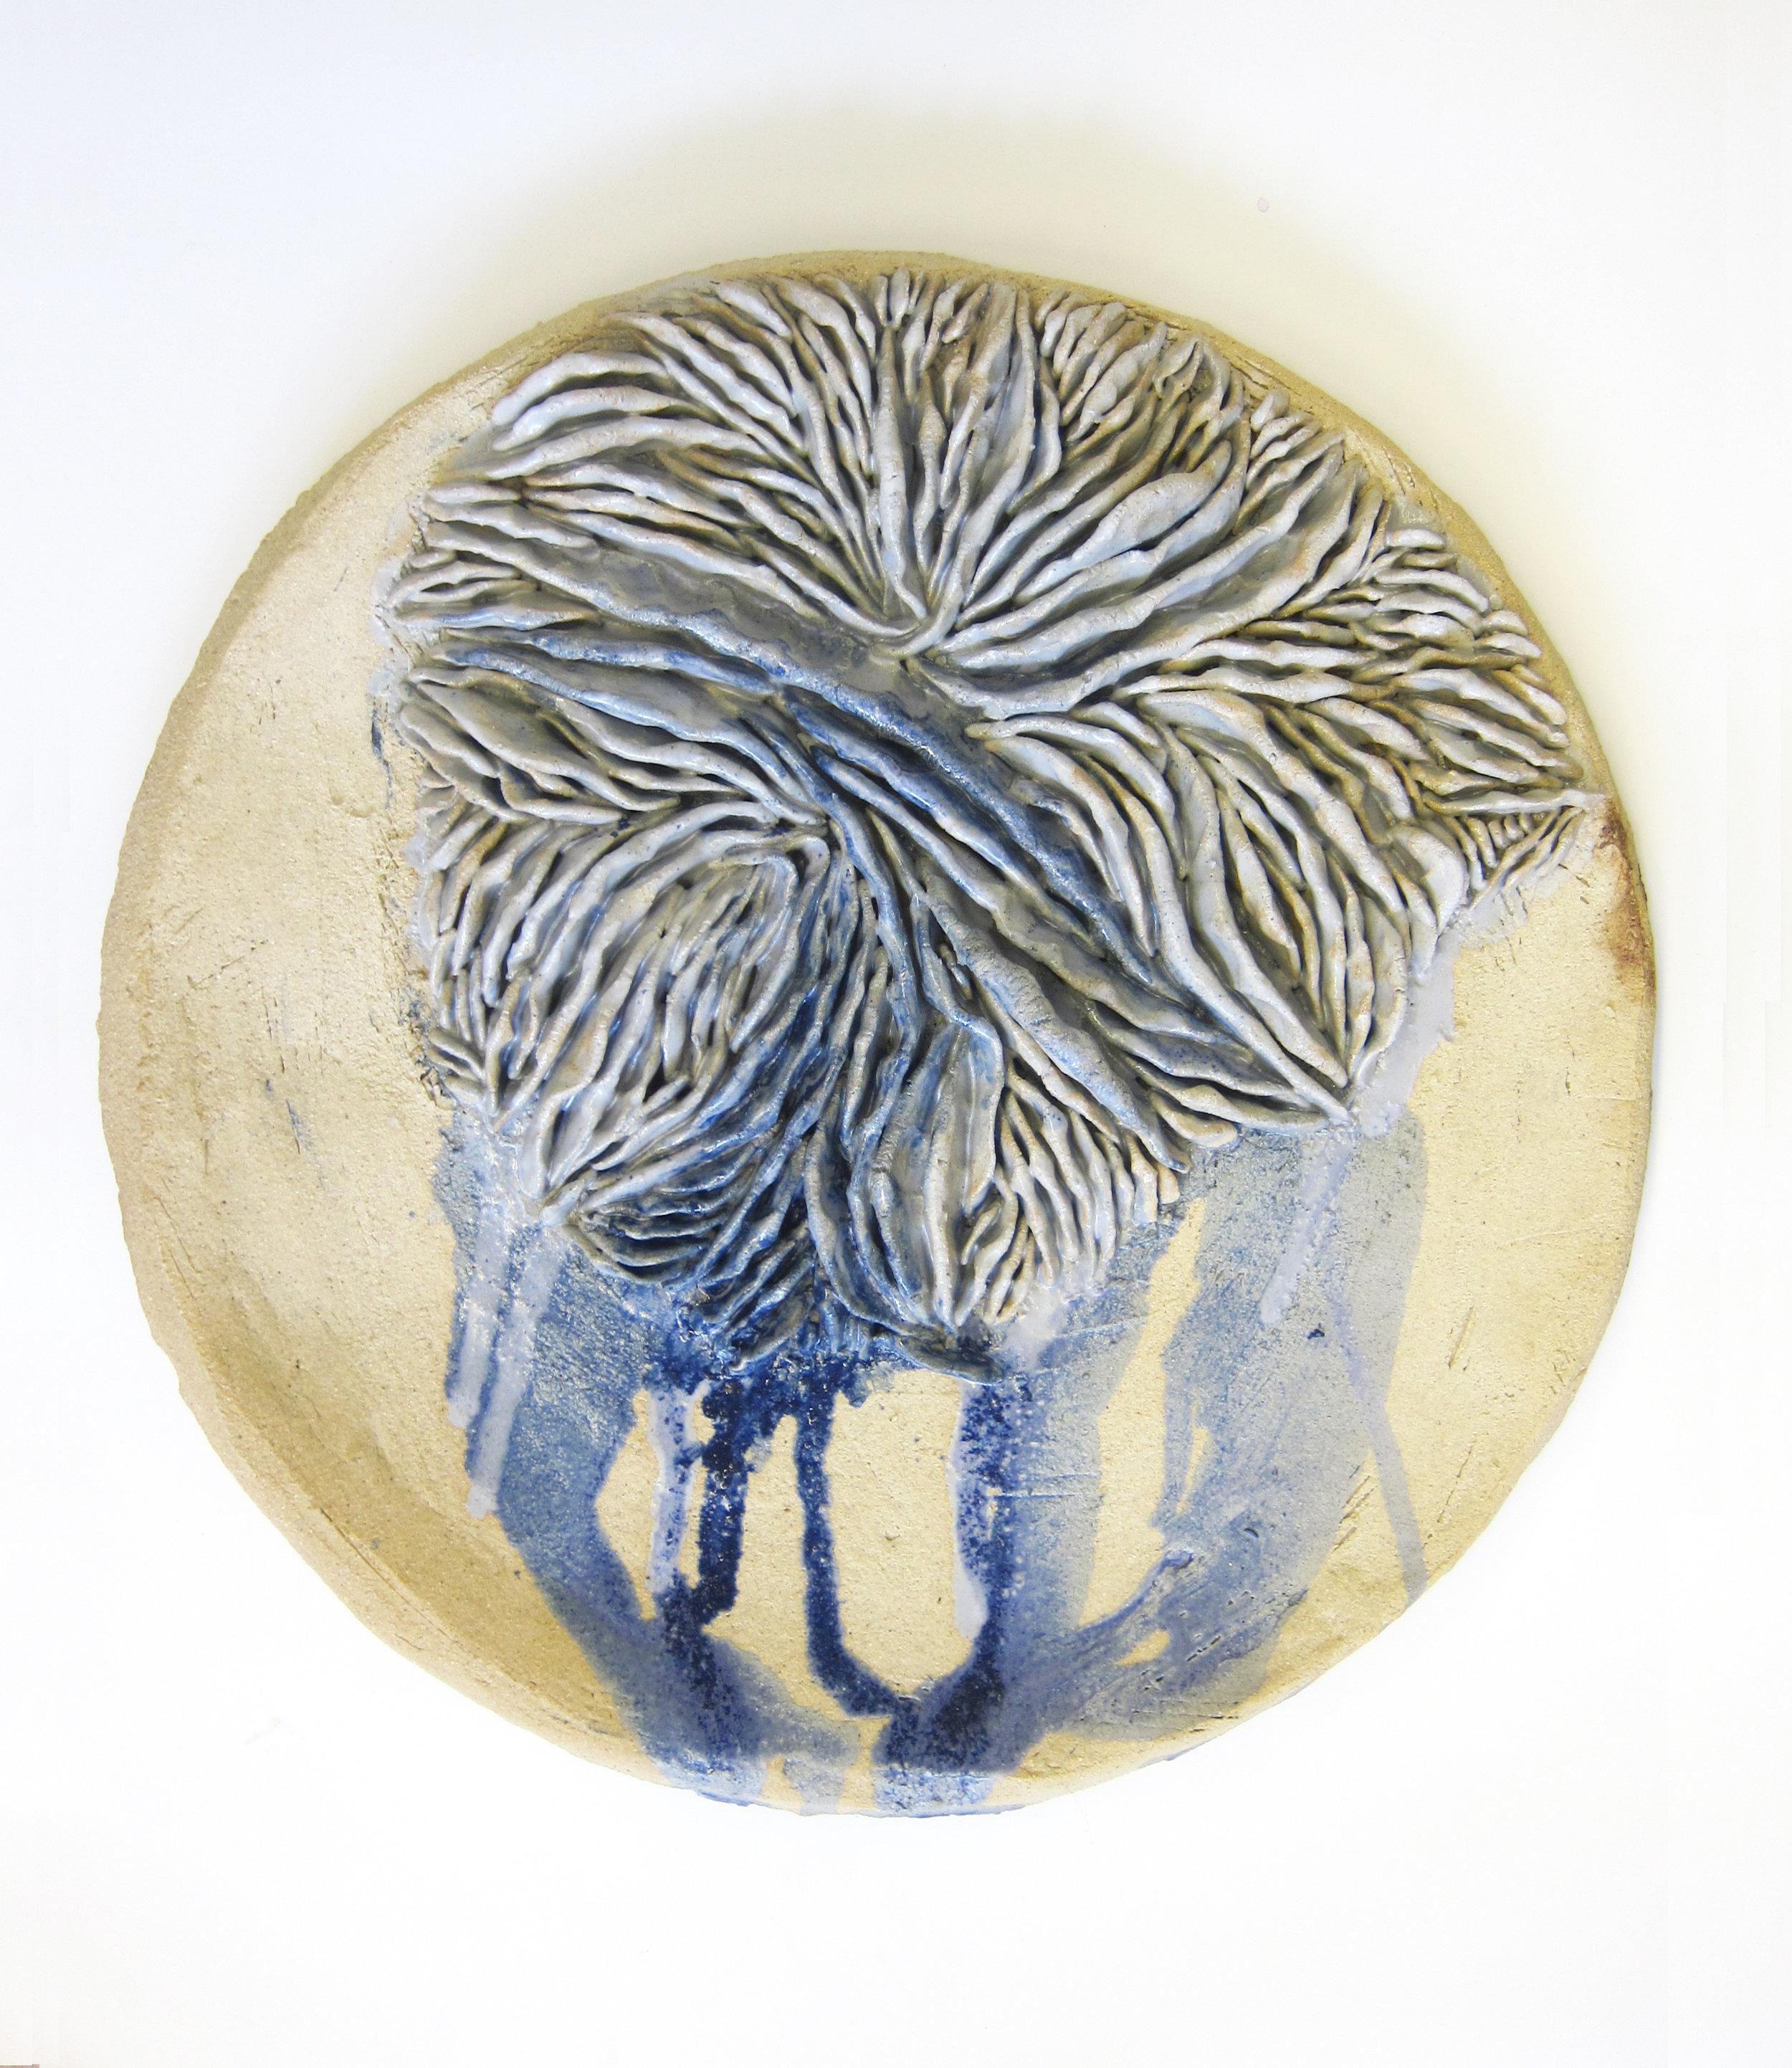 "Nicki Green,  Texture Studies (gills) , 2018. Glazed stoneware. 17"" x 17"" x 3"""